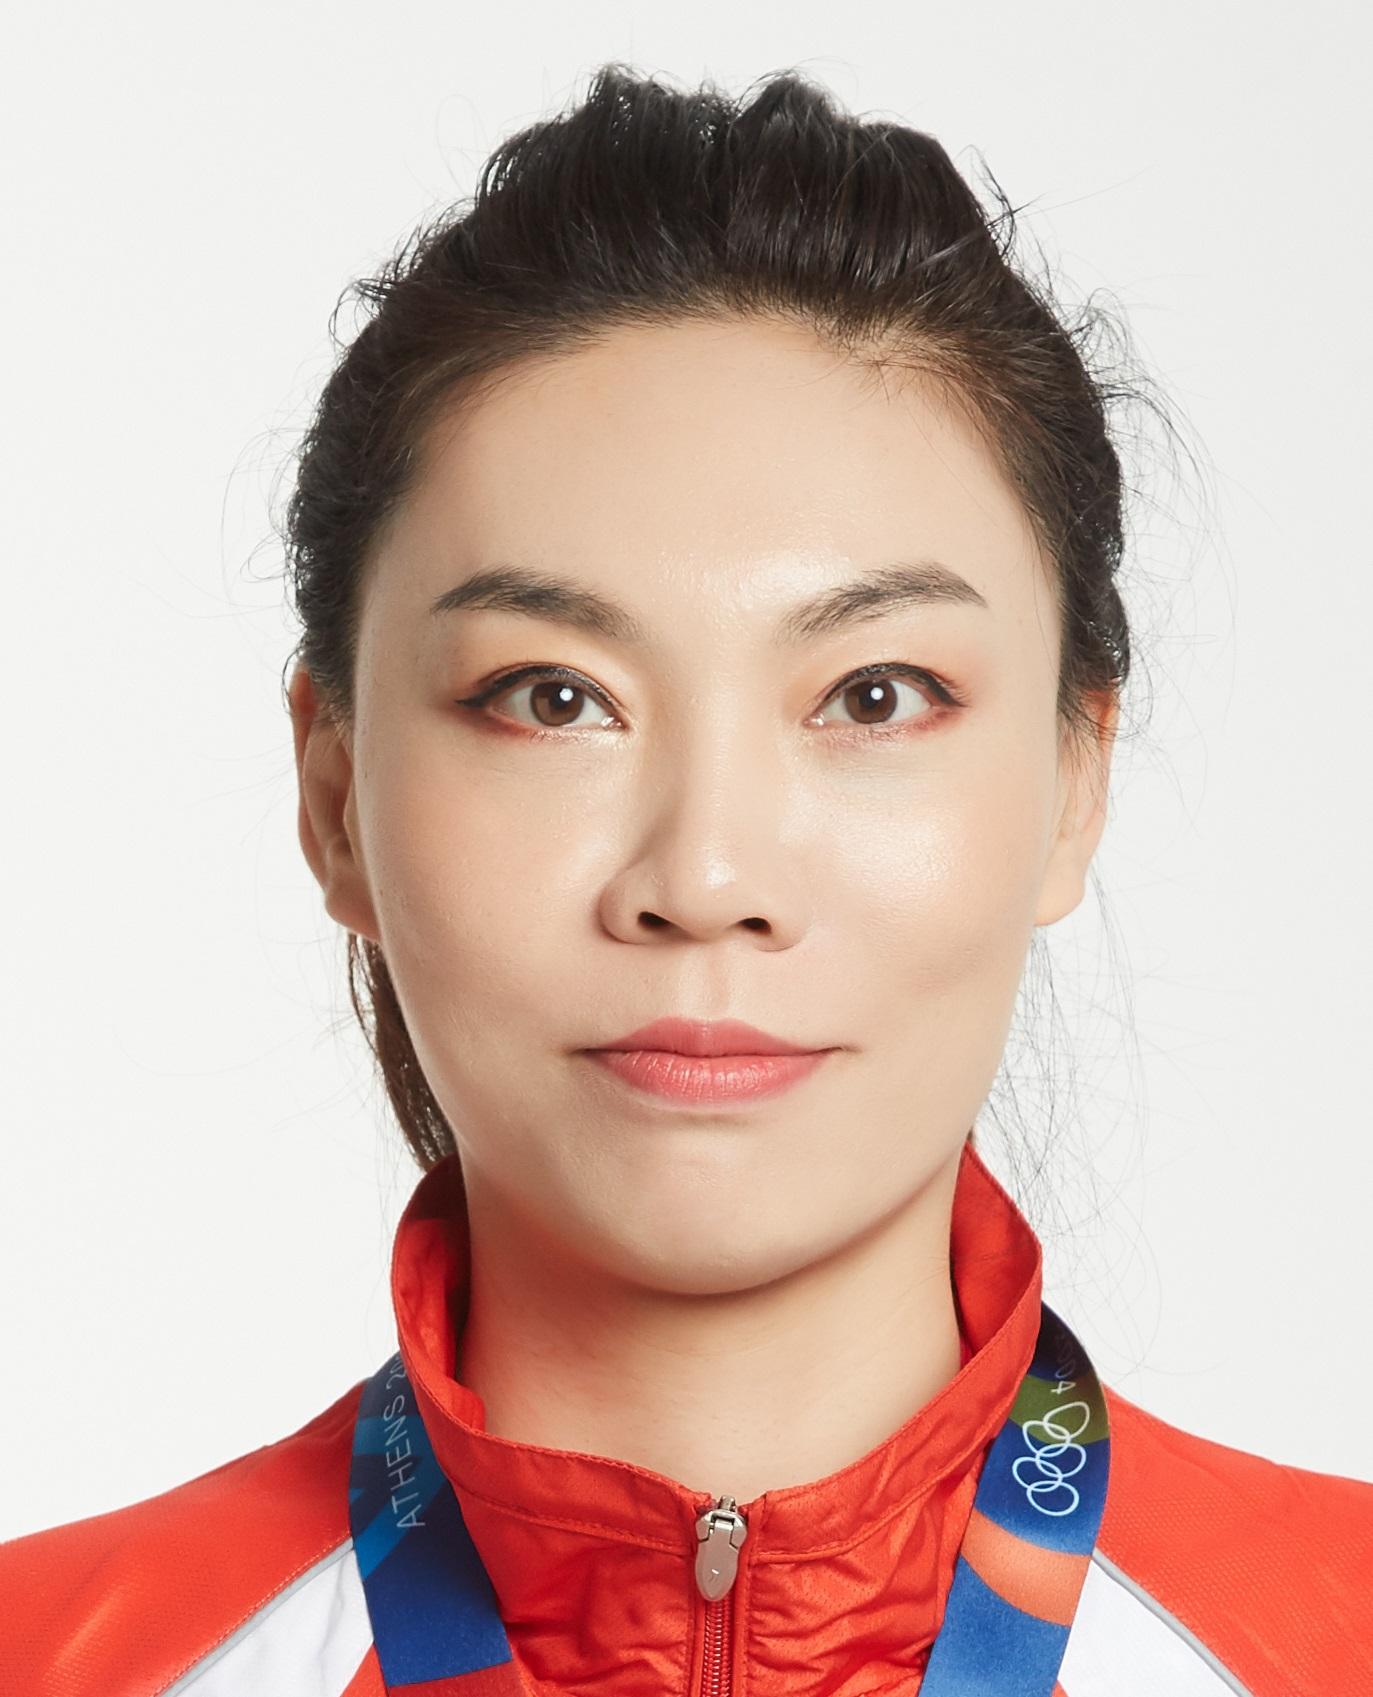 pingzhang